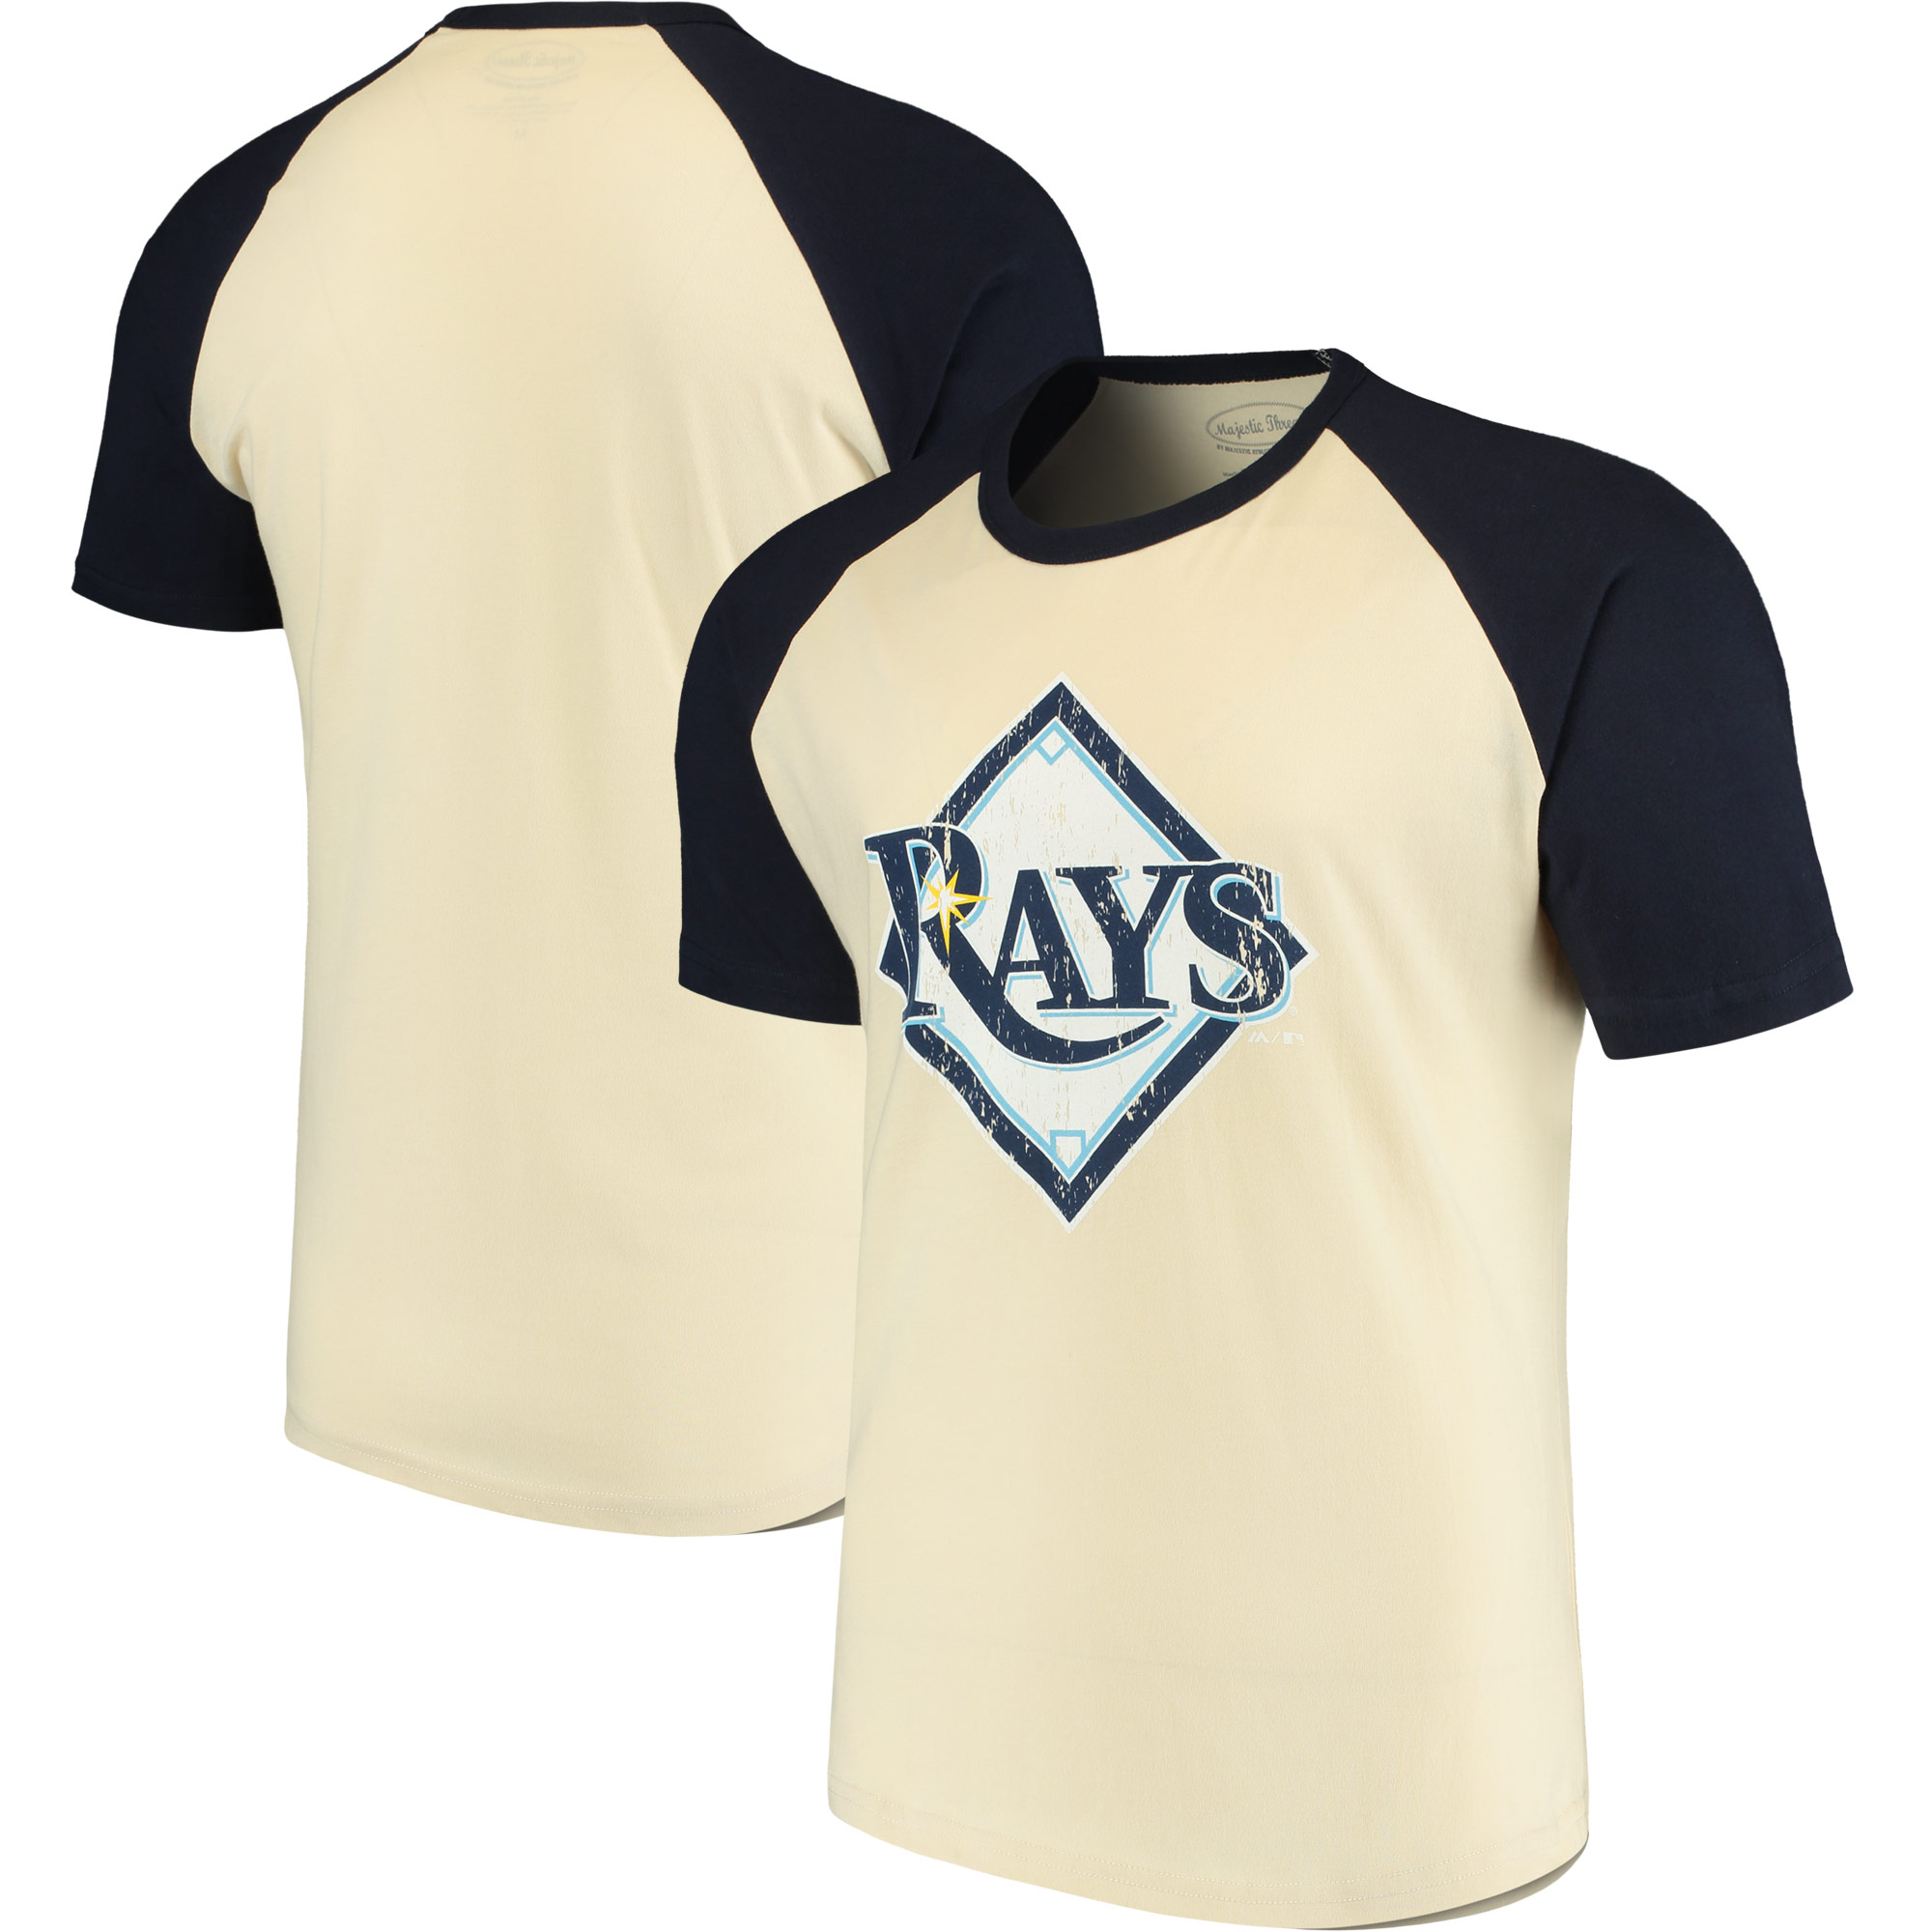 Tampa Bay Rays Majestic Threads Softhand Raglan T-Shirt - Cream/Navy